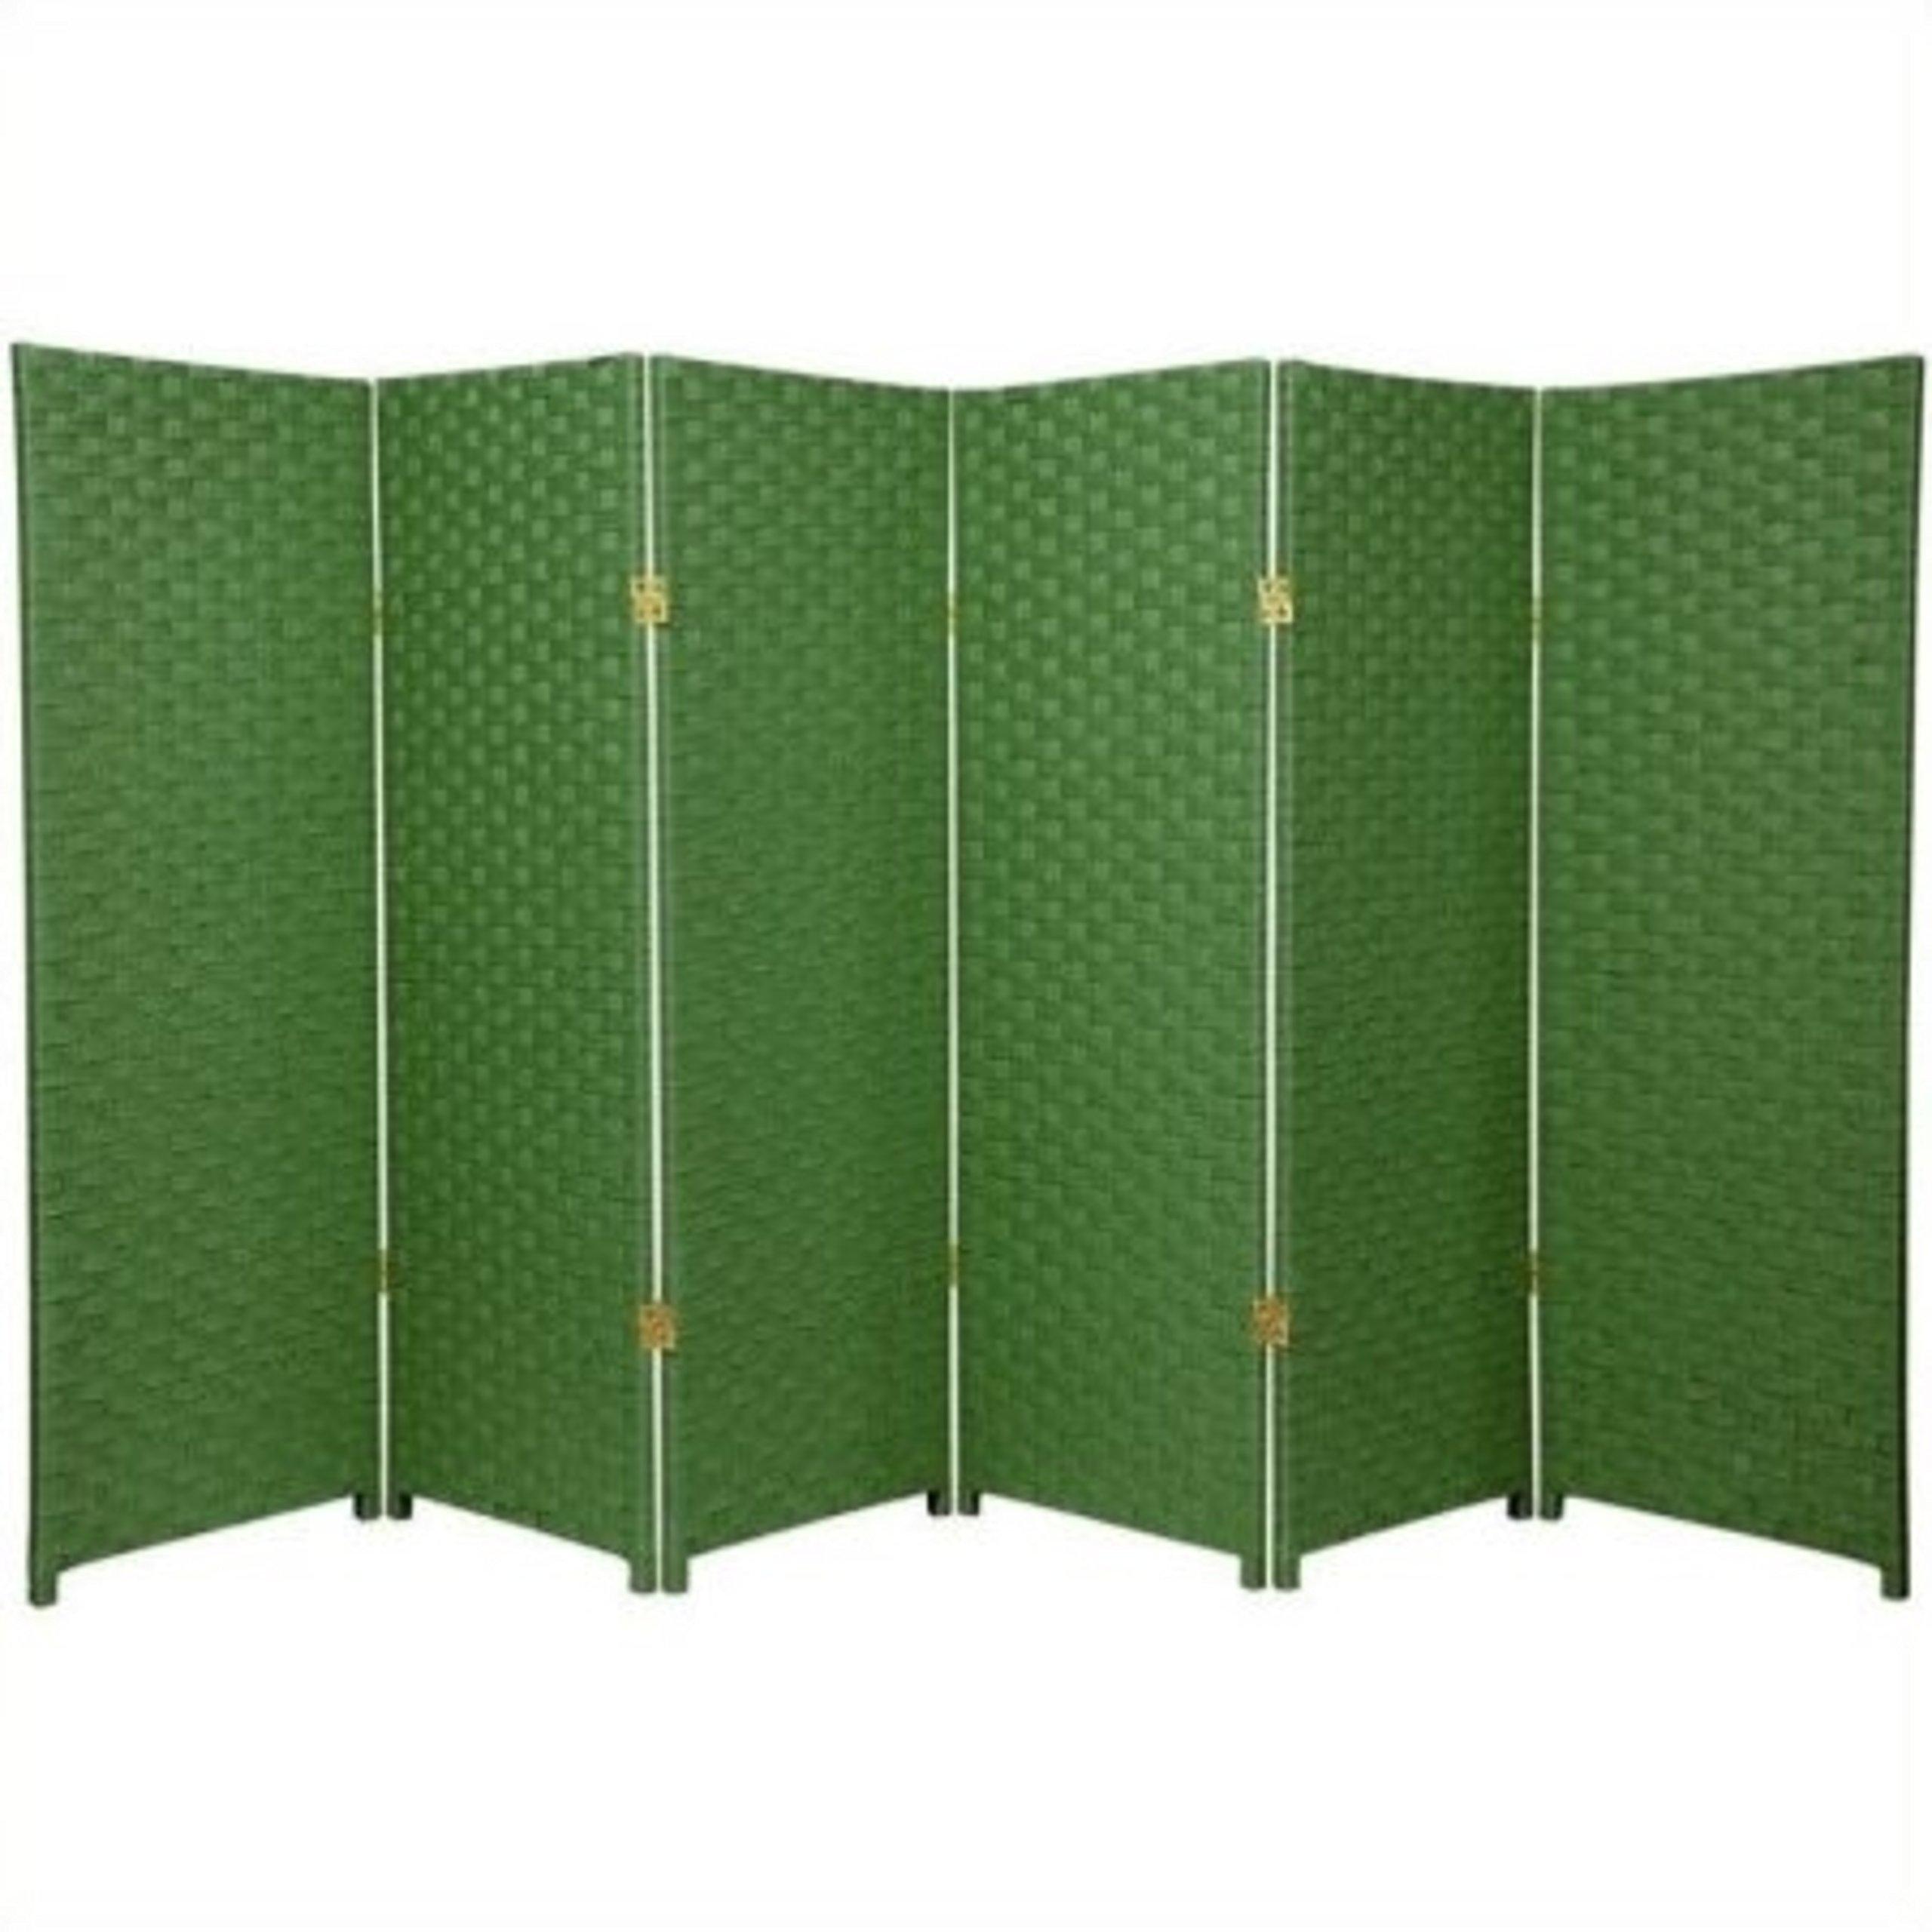 Natural Plant Fiber Woven Room Decor Light Green 6 Panels Divider